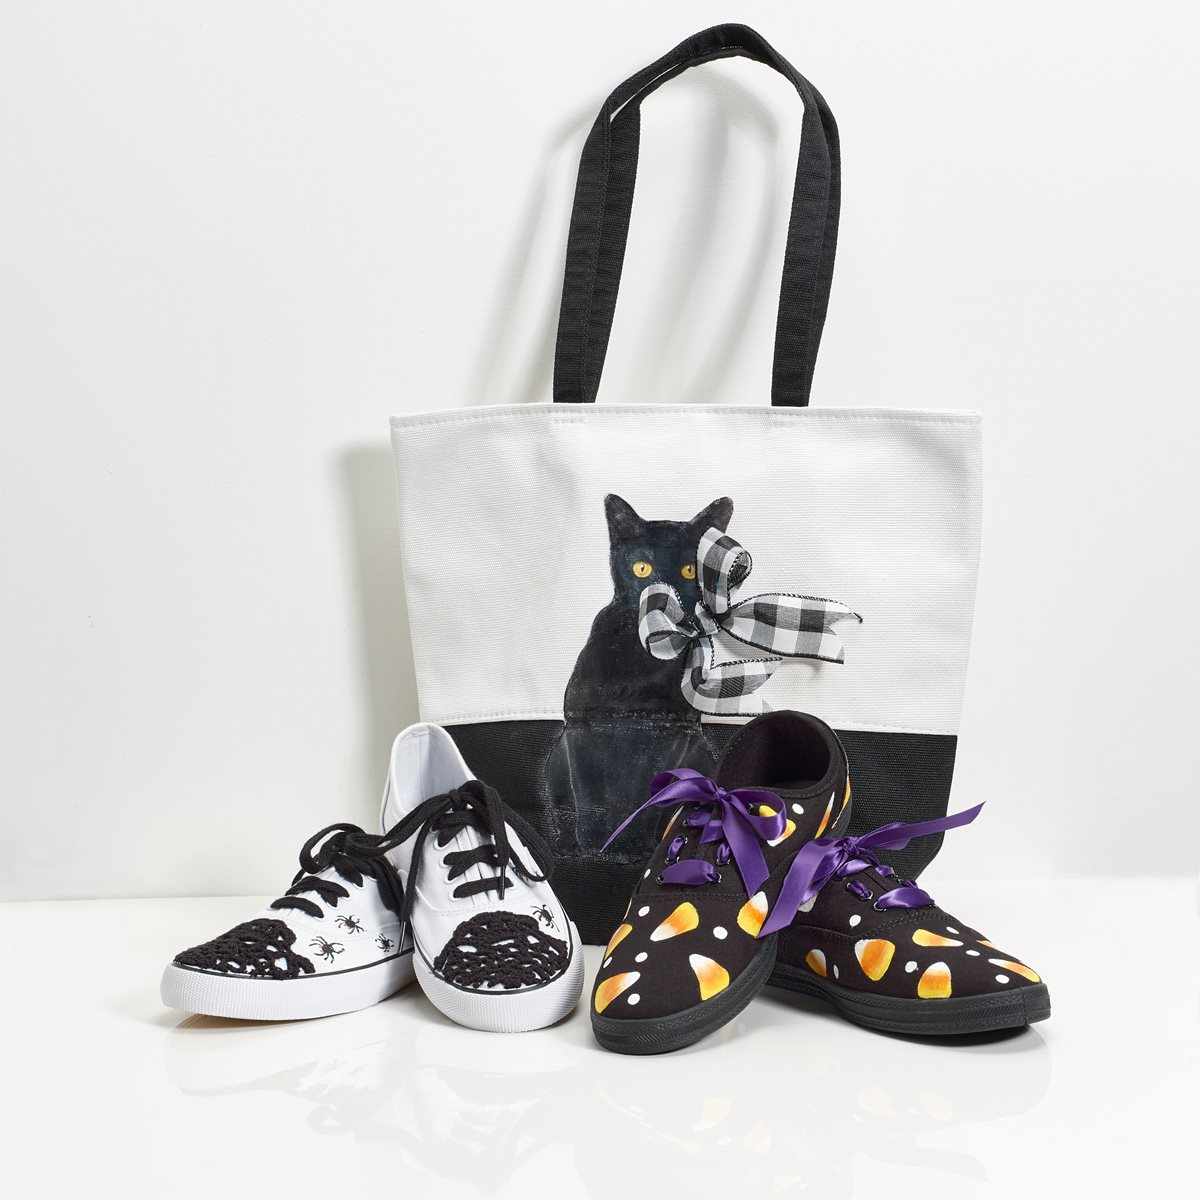 Mod Podge Photo Transfer Black Cat Canvas Tote Bag